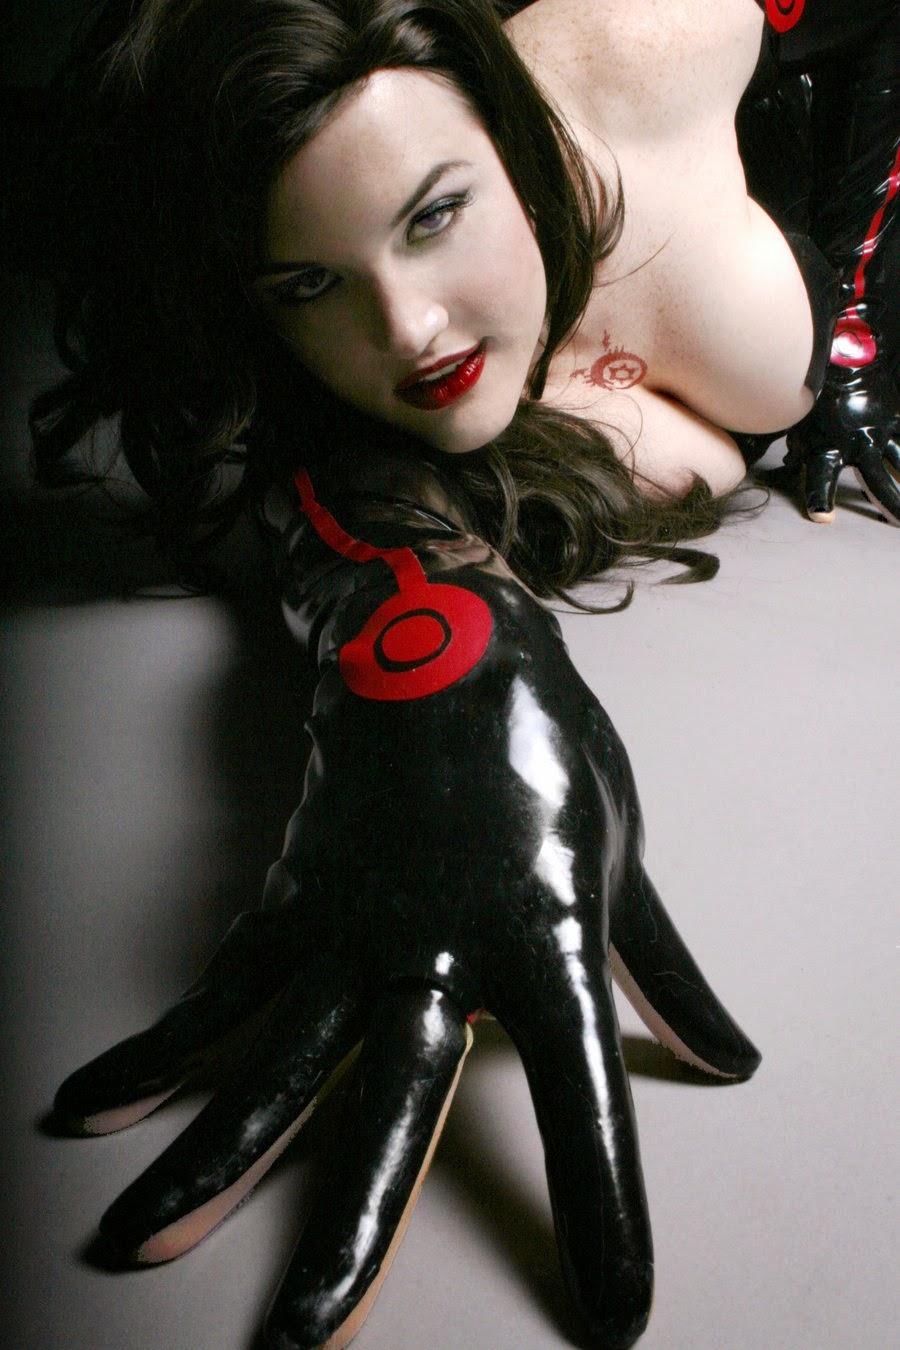 photo de cosplay féminin sexy de lust de fullmetal alchemist en combinaison de latex